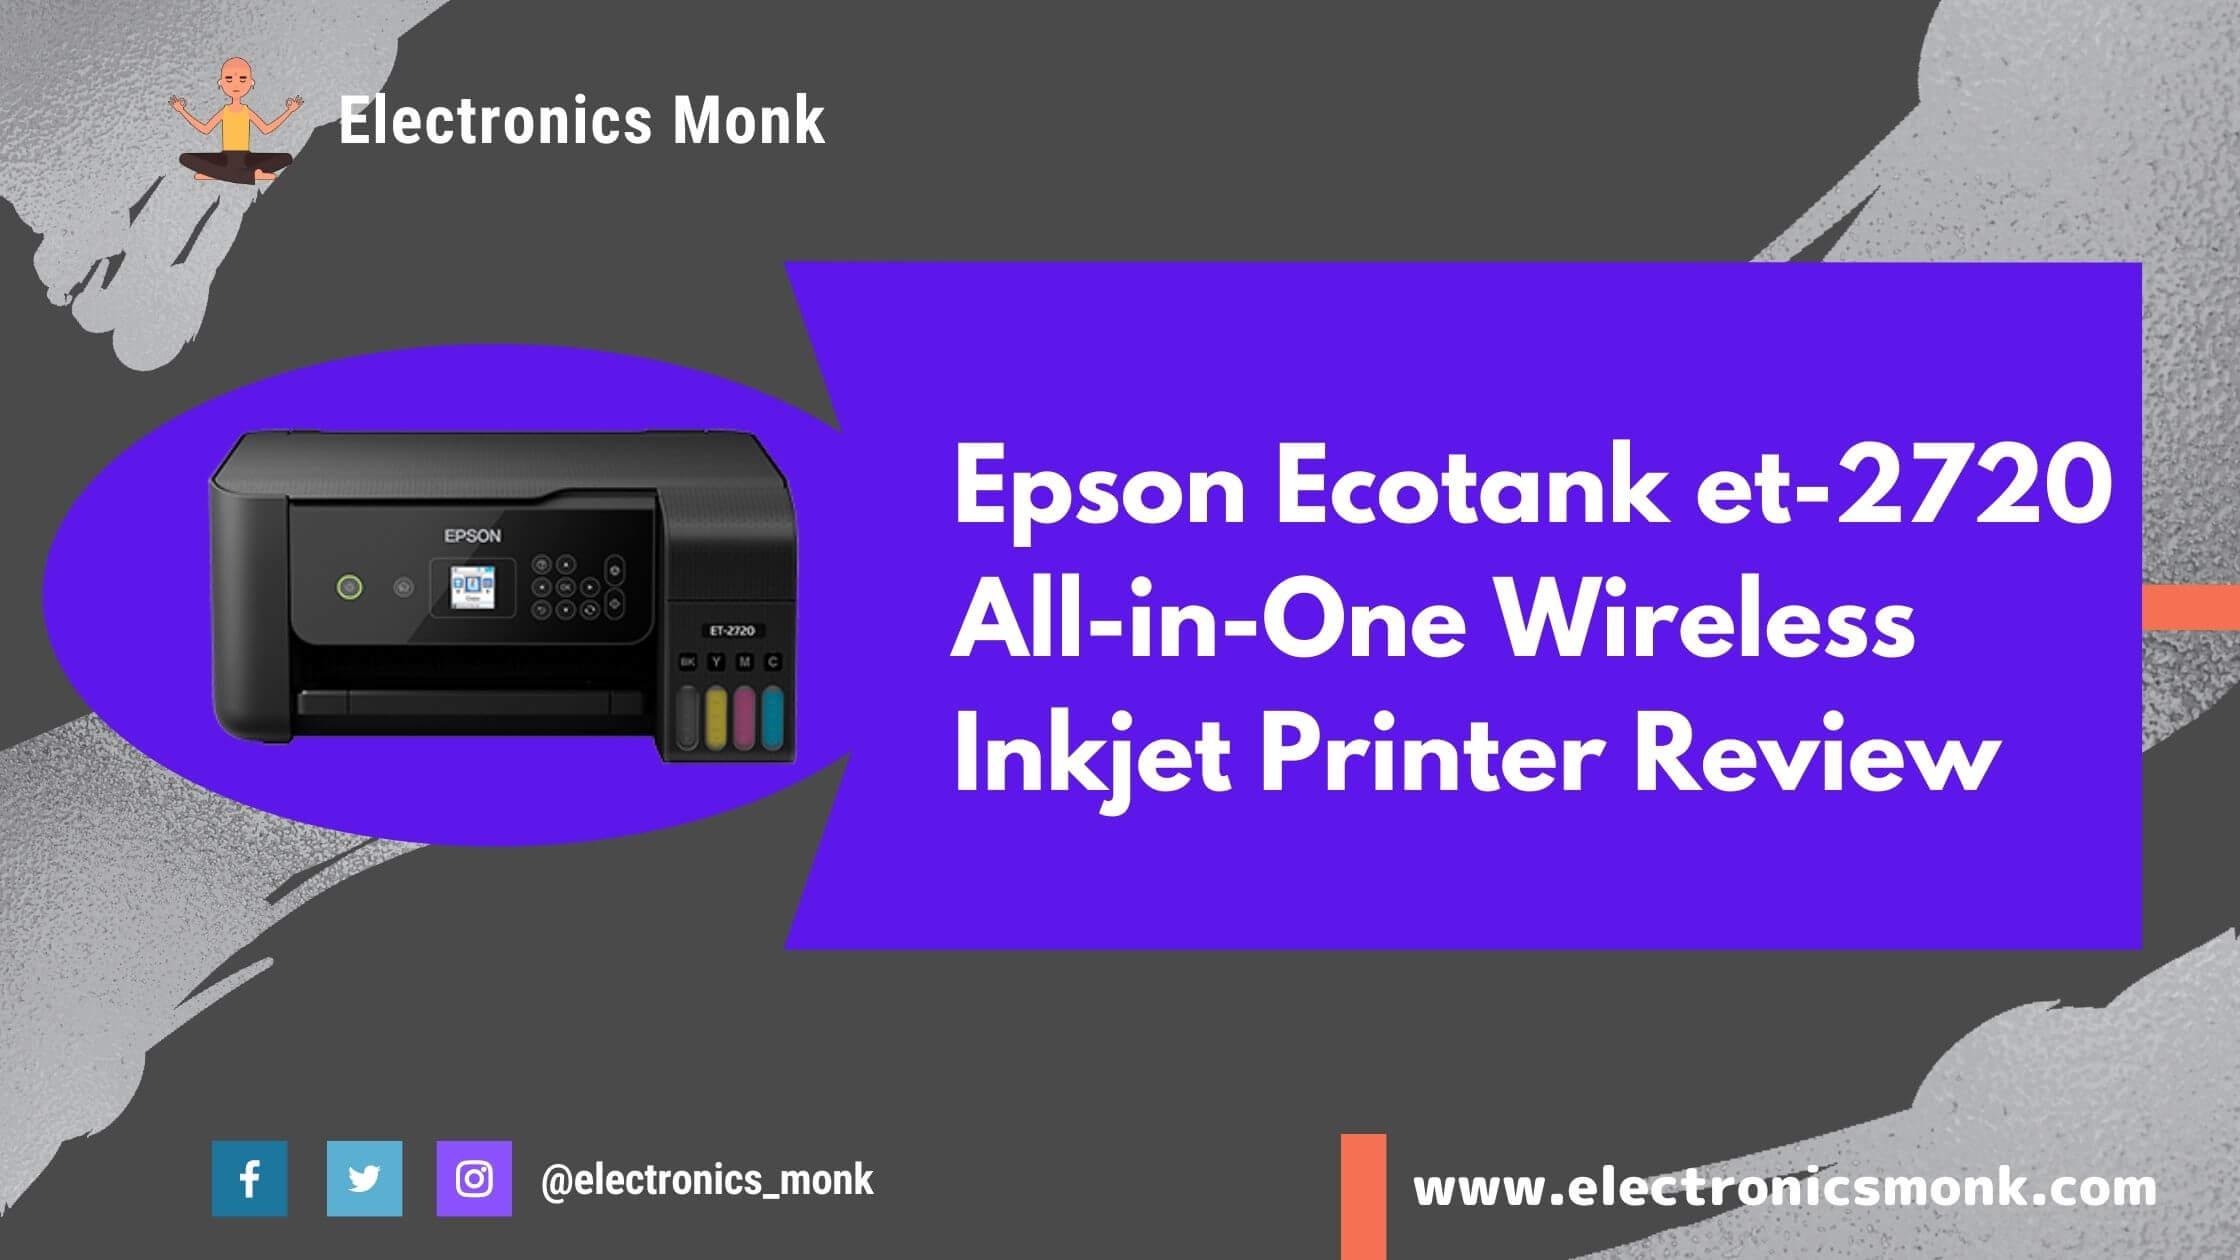 Espon Ecotank et-2720 All-in-one Wireless Inkjet Printer Review